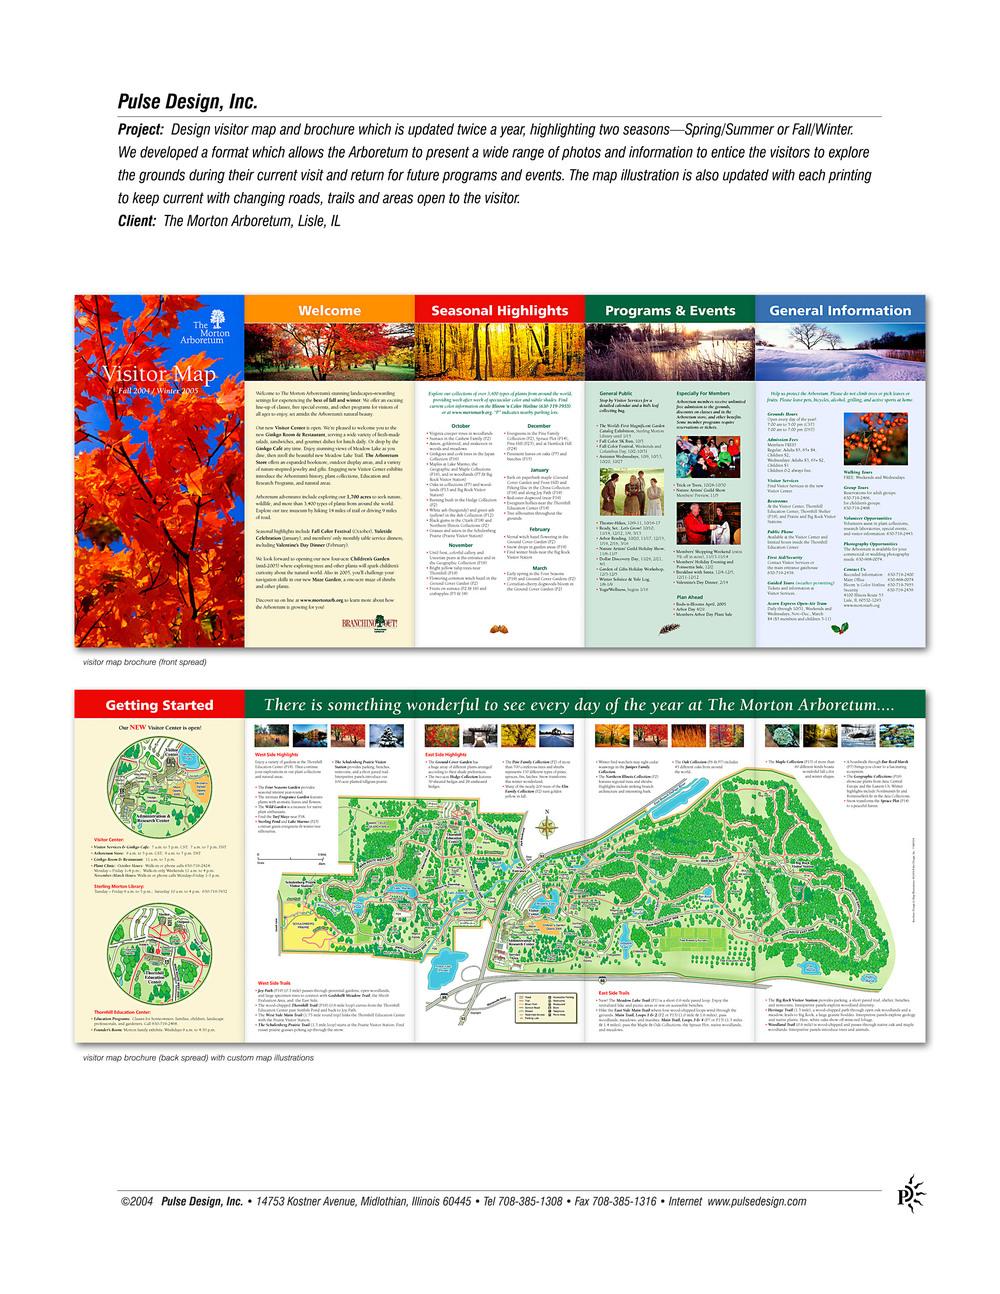 Morton-Arboretum-Visitor-Map-Fall-Pulse-Design-Inc.jpg